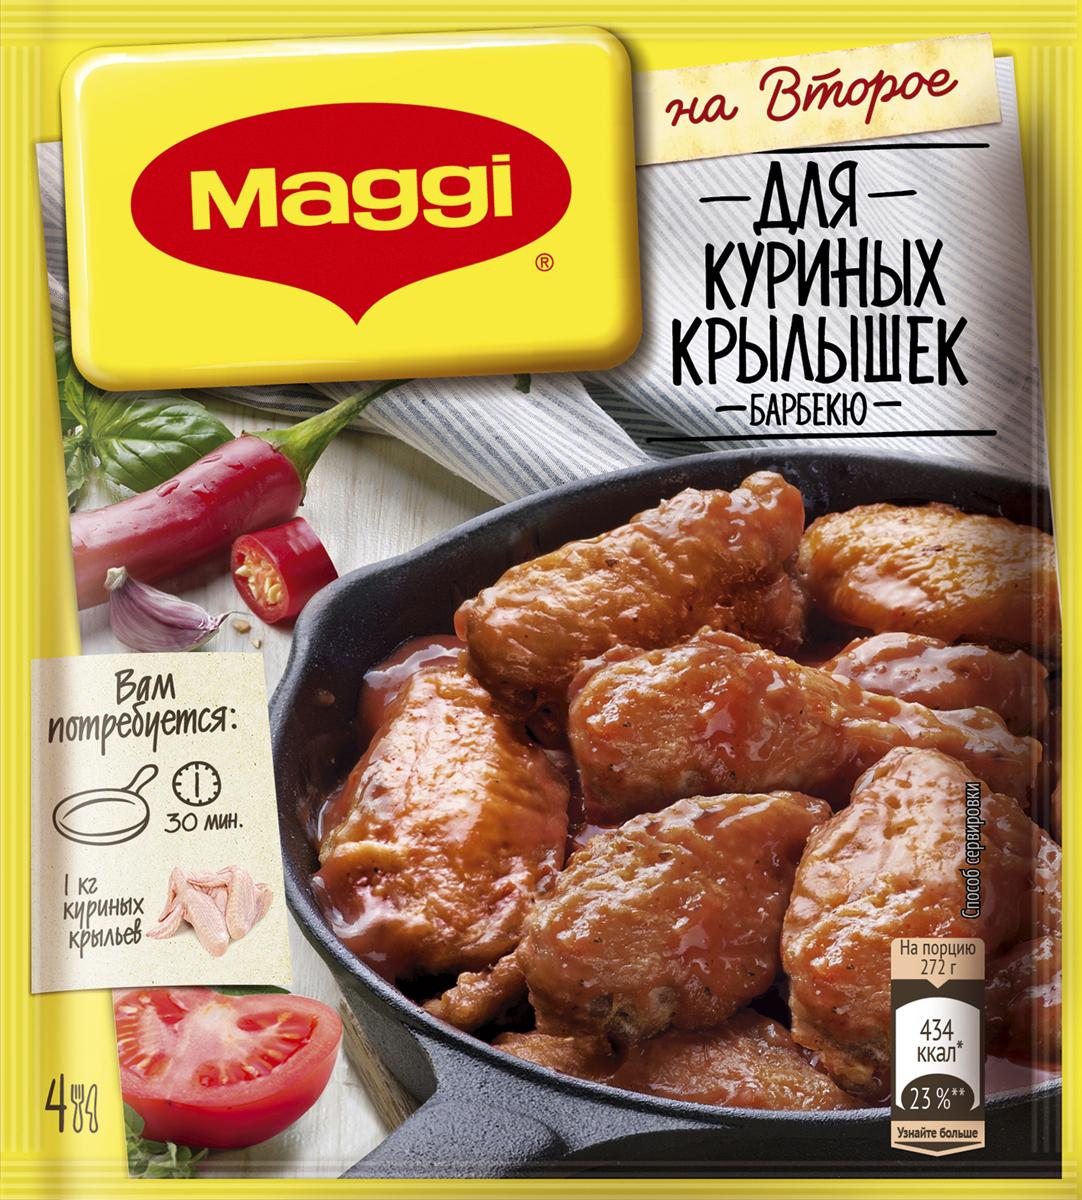 Maggi для крылышек барбекю, 24 г maggi на второе для сочных ребрышек барбекю 30 г